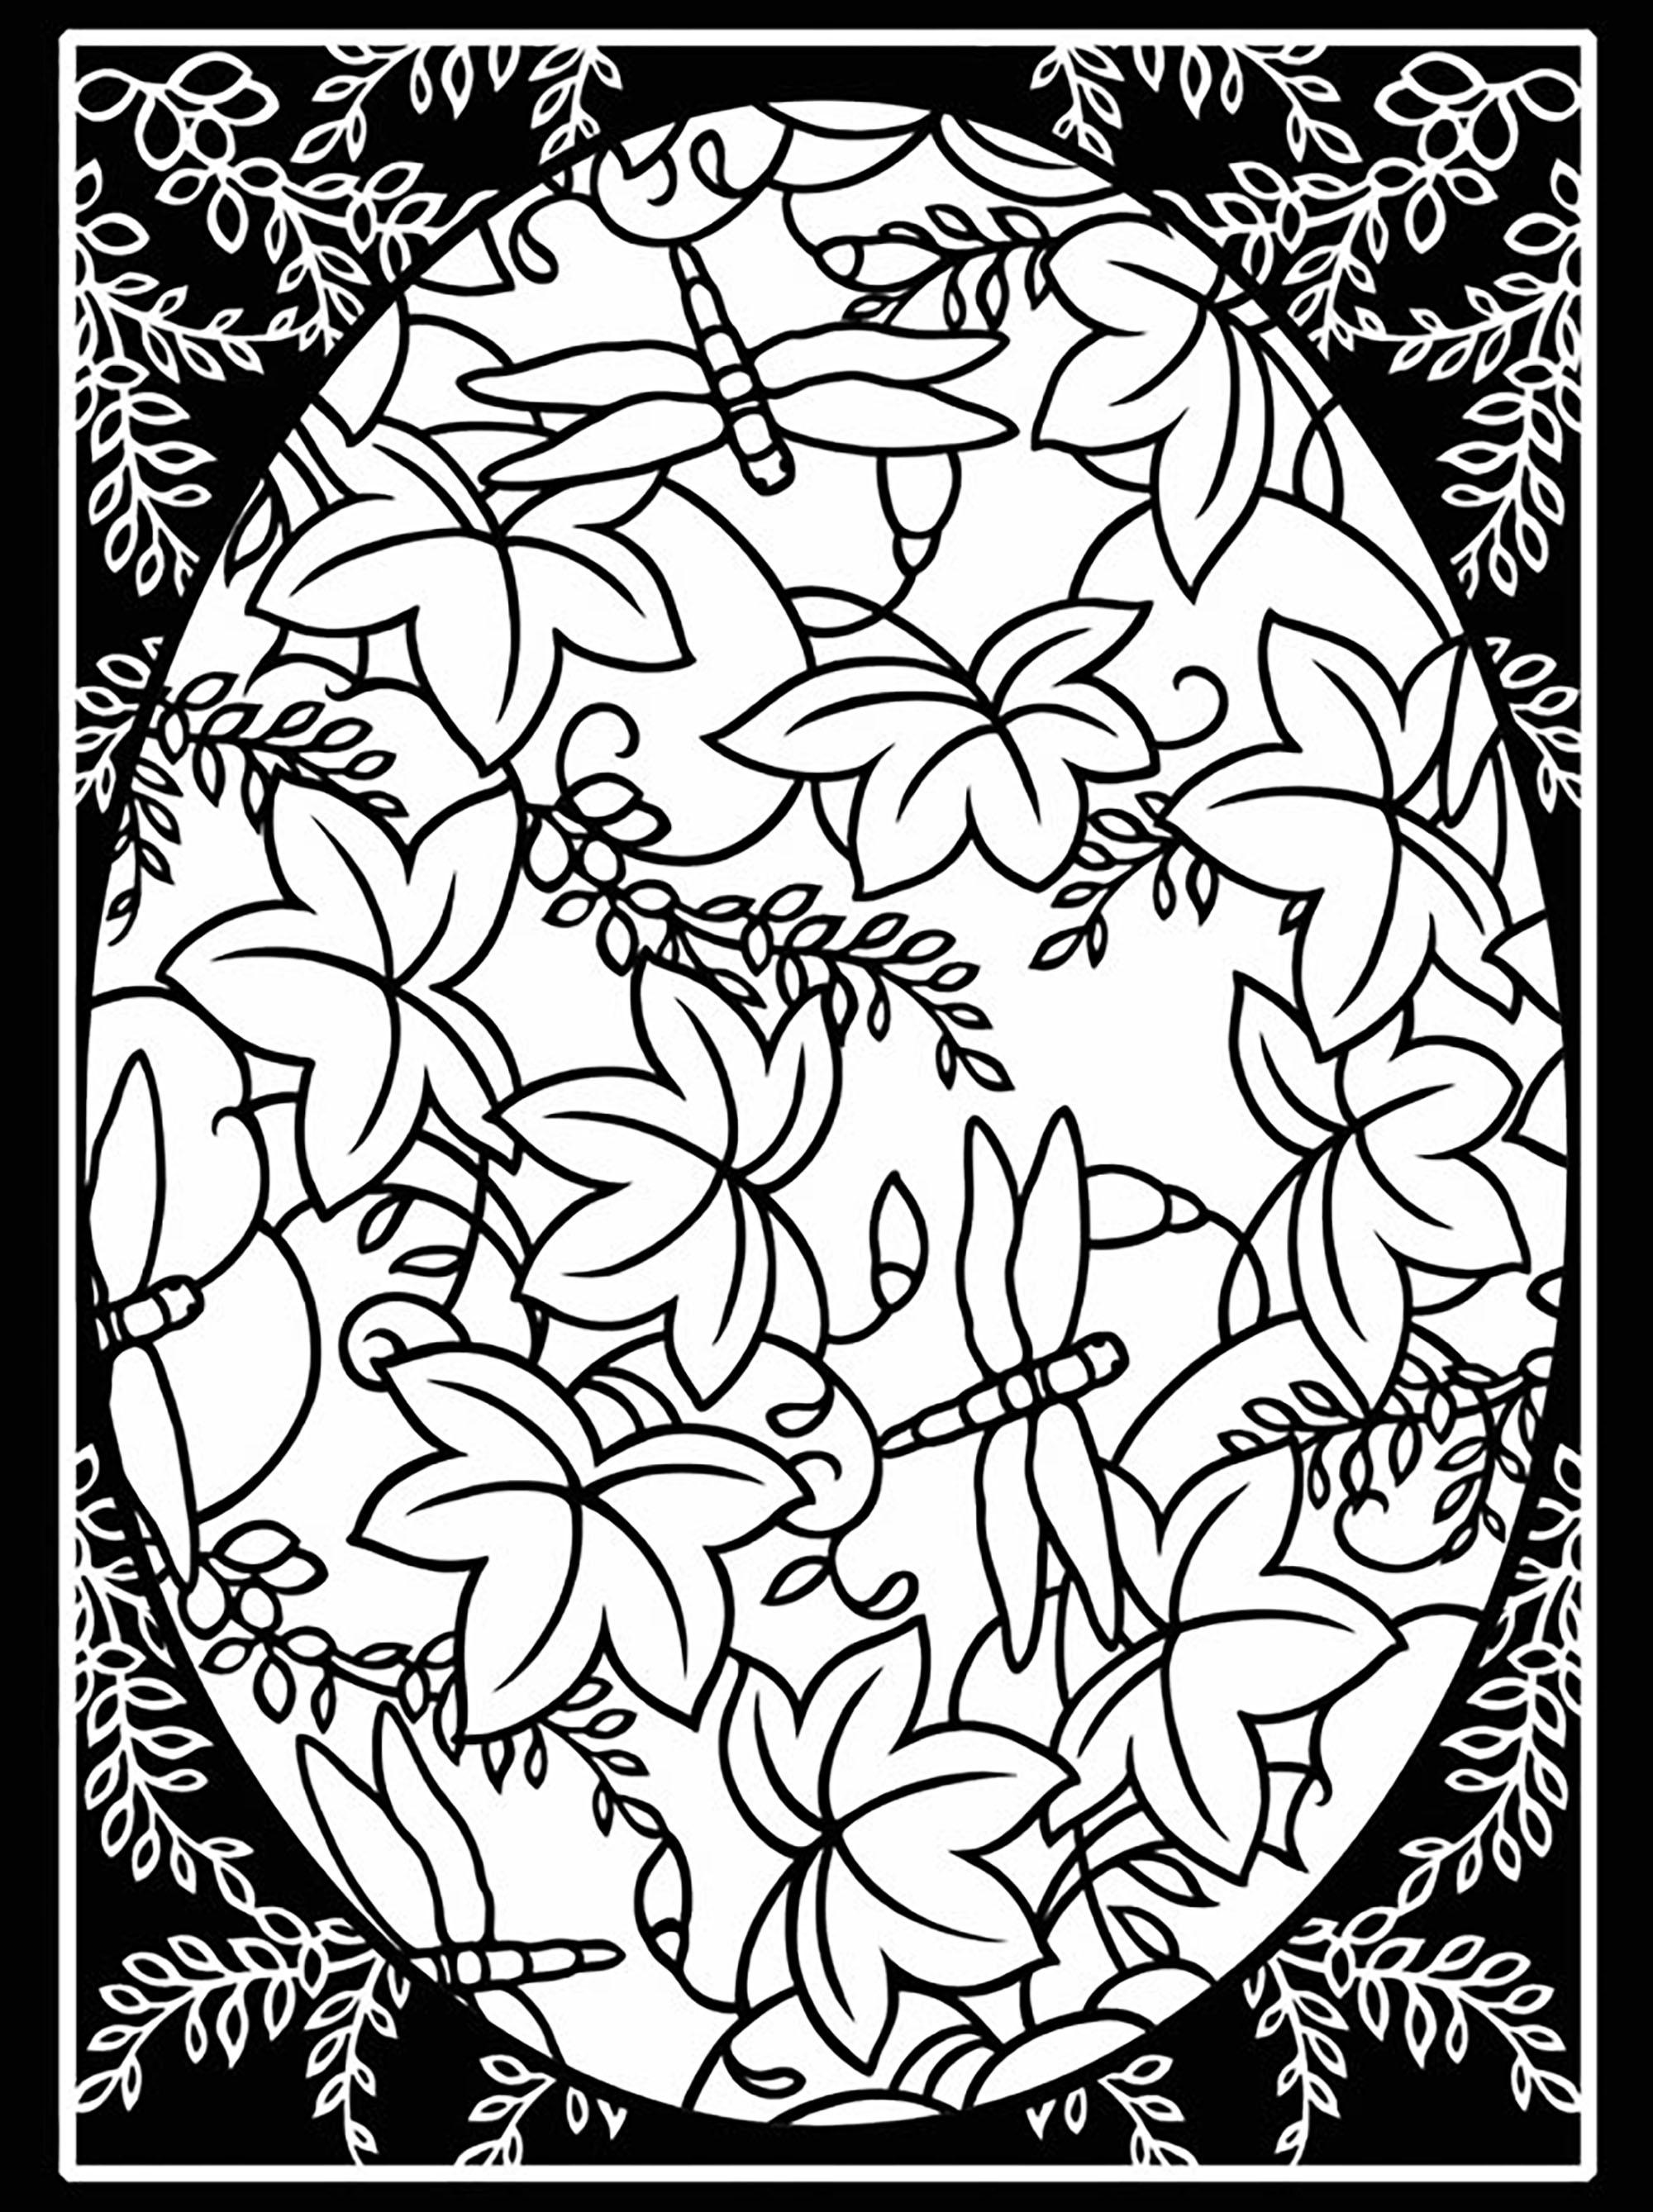 Oeuf de Pâques avec jolies feuilles